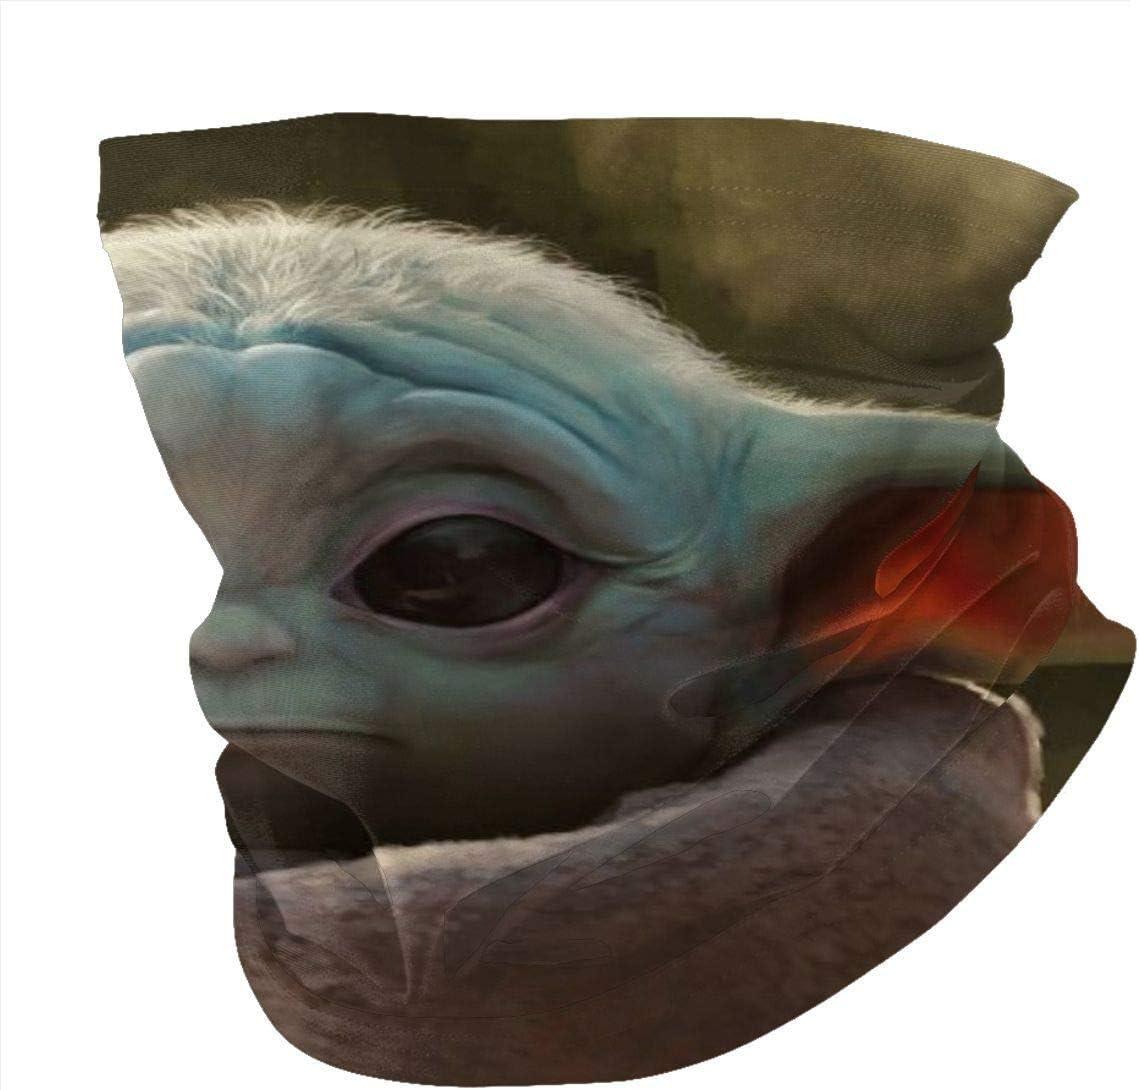 jhgfd7523 The Mandalorian Sports Riding Mask Headwear Face Scarf Cover Unisex Outdoor Headband Turban Neck Windproof Case Sun Protection Seamless Bandana 50 X 25 Cm